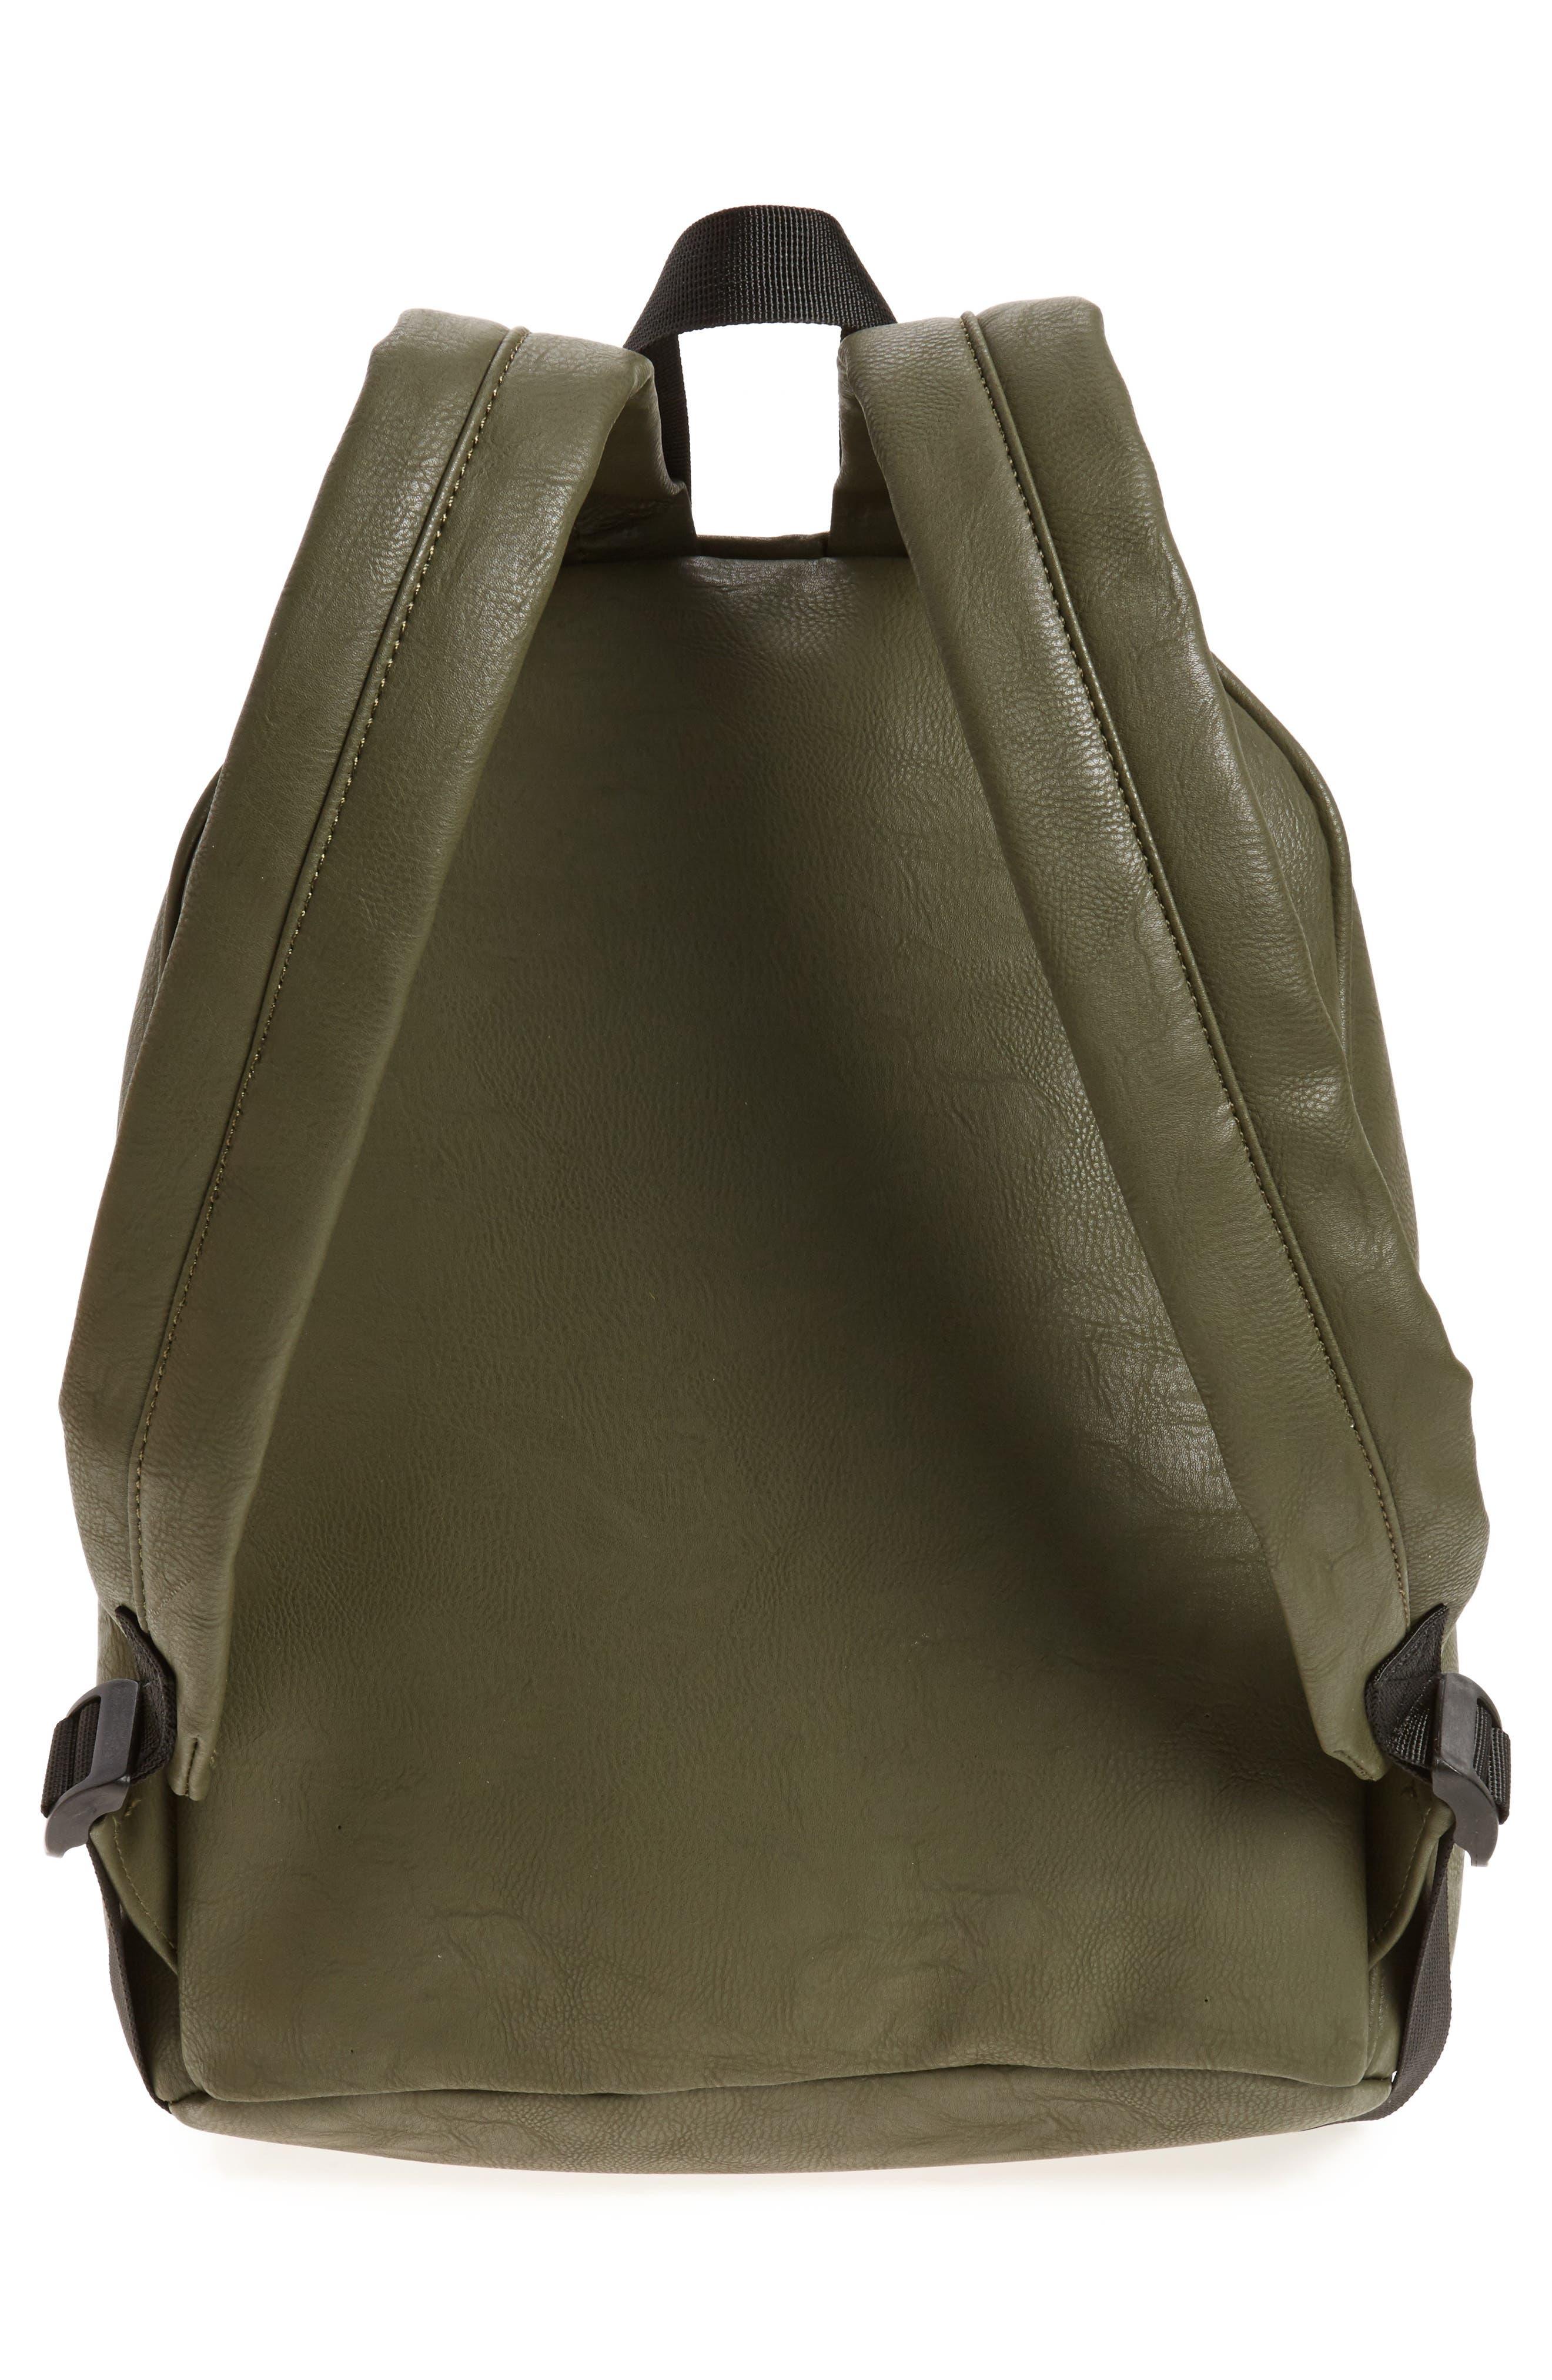 Sequin Rose Appliqué Faux Leather Backpack,                             Alternate thumbnail 3, color,                             Olive